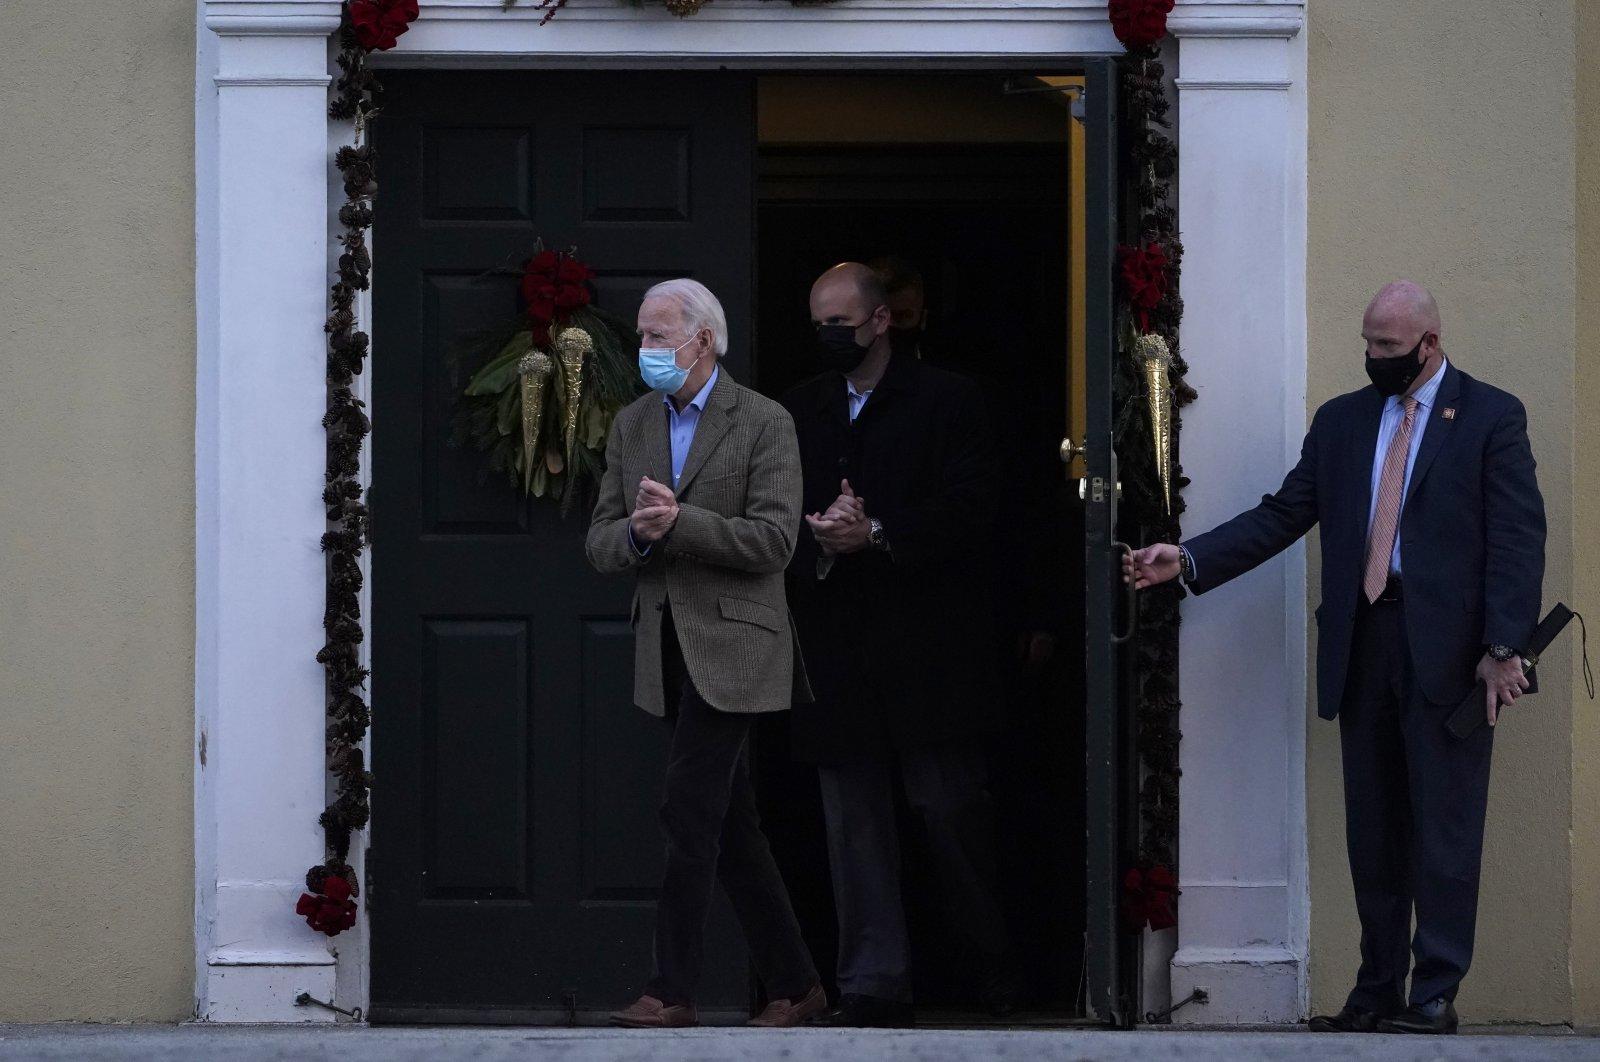 President-elect Joe Biden leaves after attending mass at St. Joseph on the Brandywine Catholic Church in Wilmington, Delaware, U.S., Jan. 9, 2021. (AP Photo)